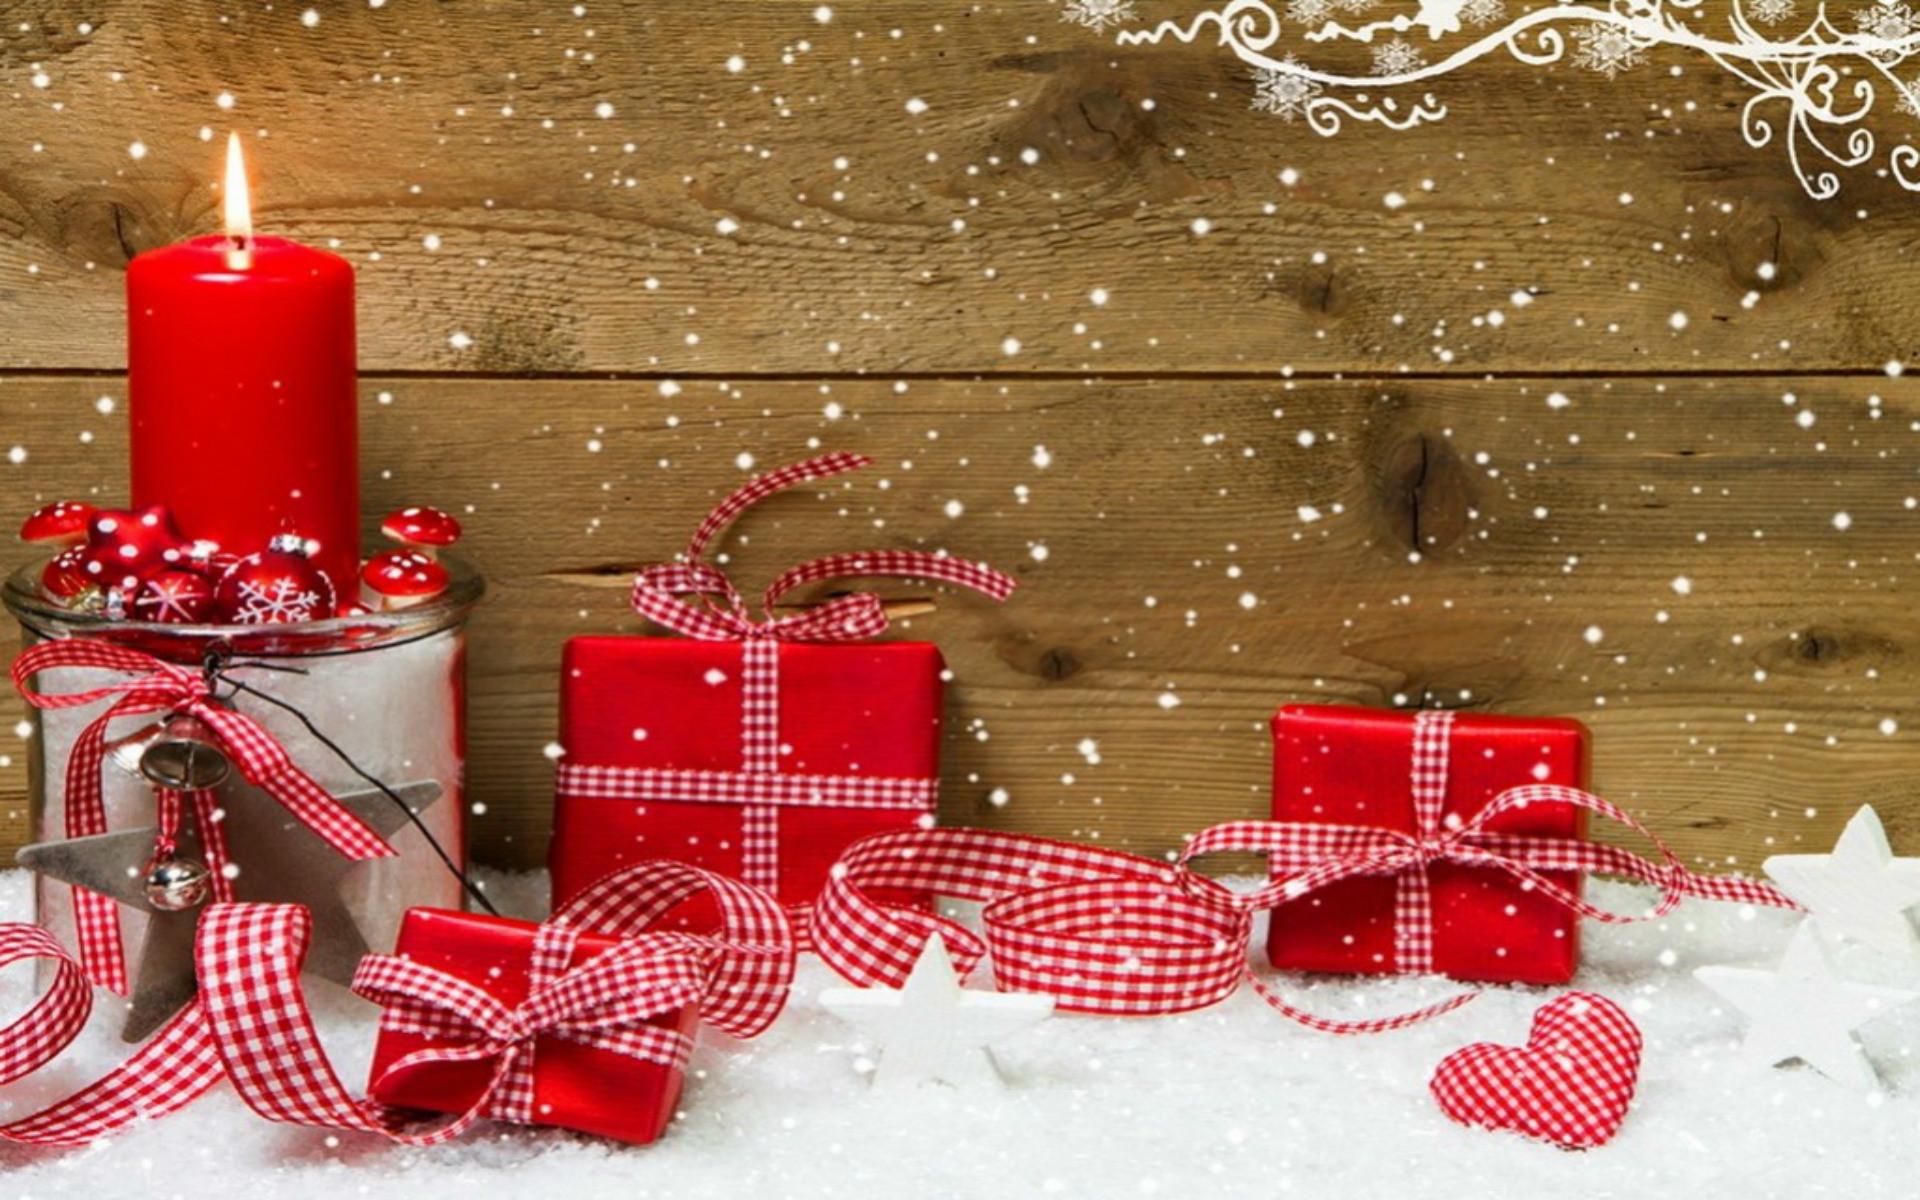 Desktop Christmas Wallpapers Backgrounds (48+ images)